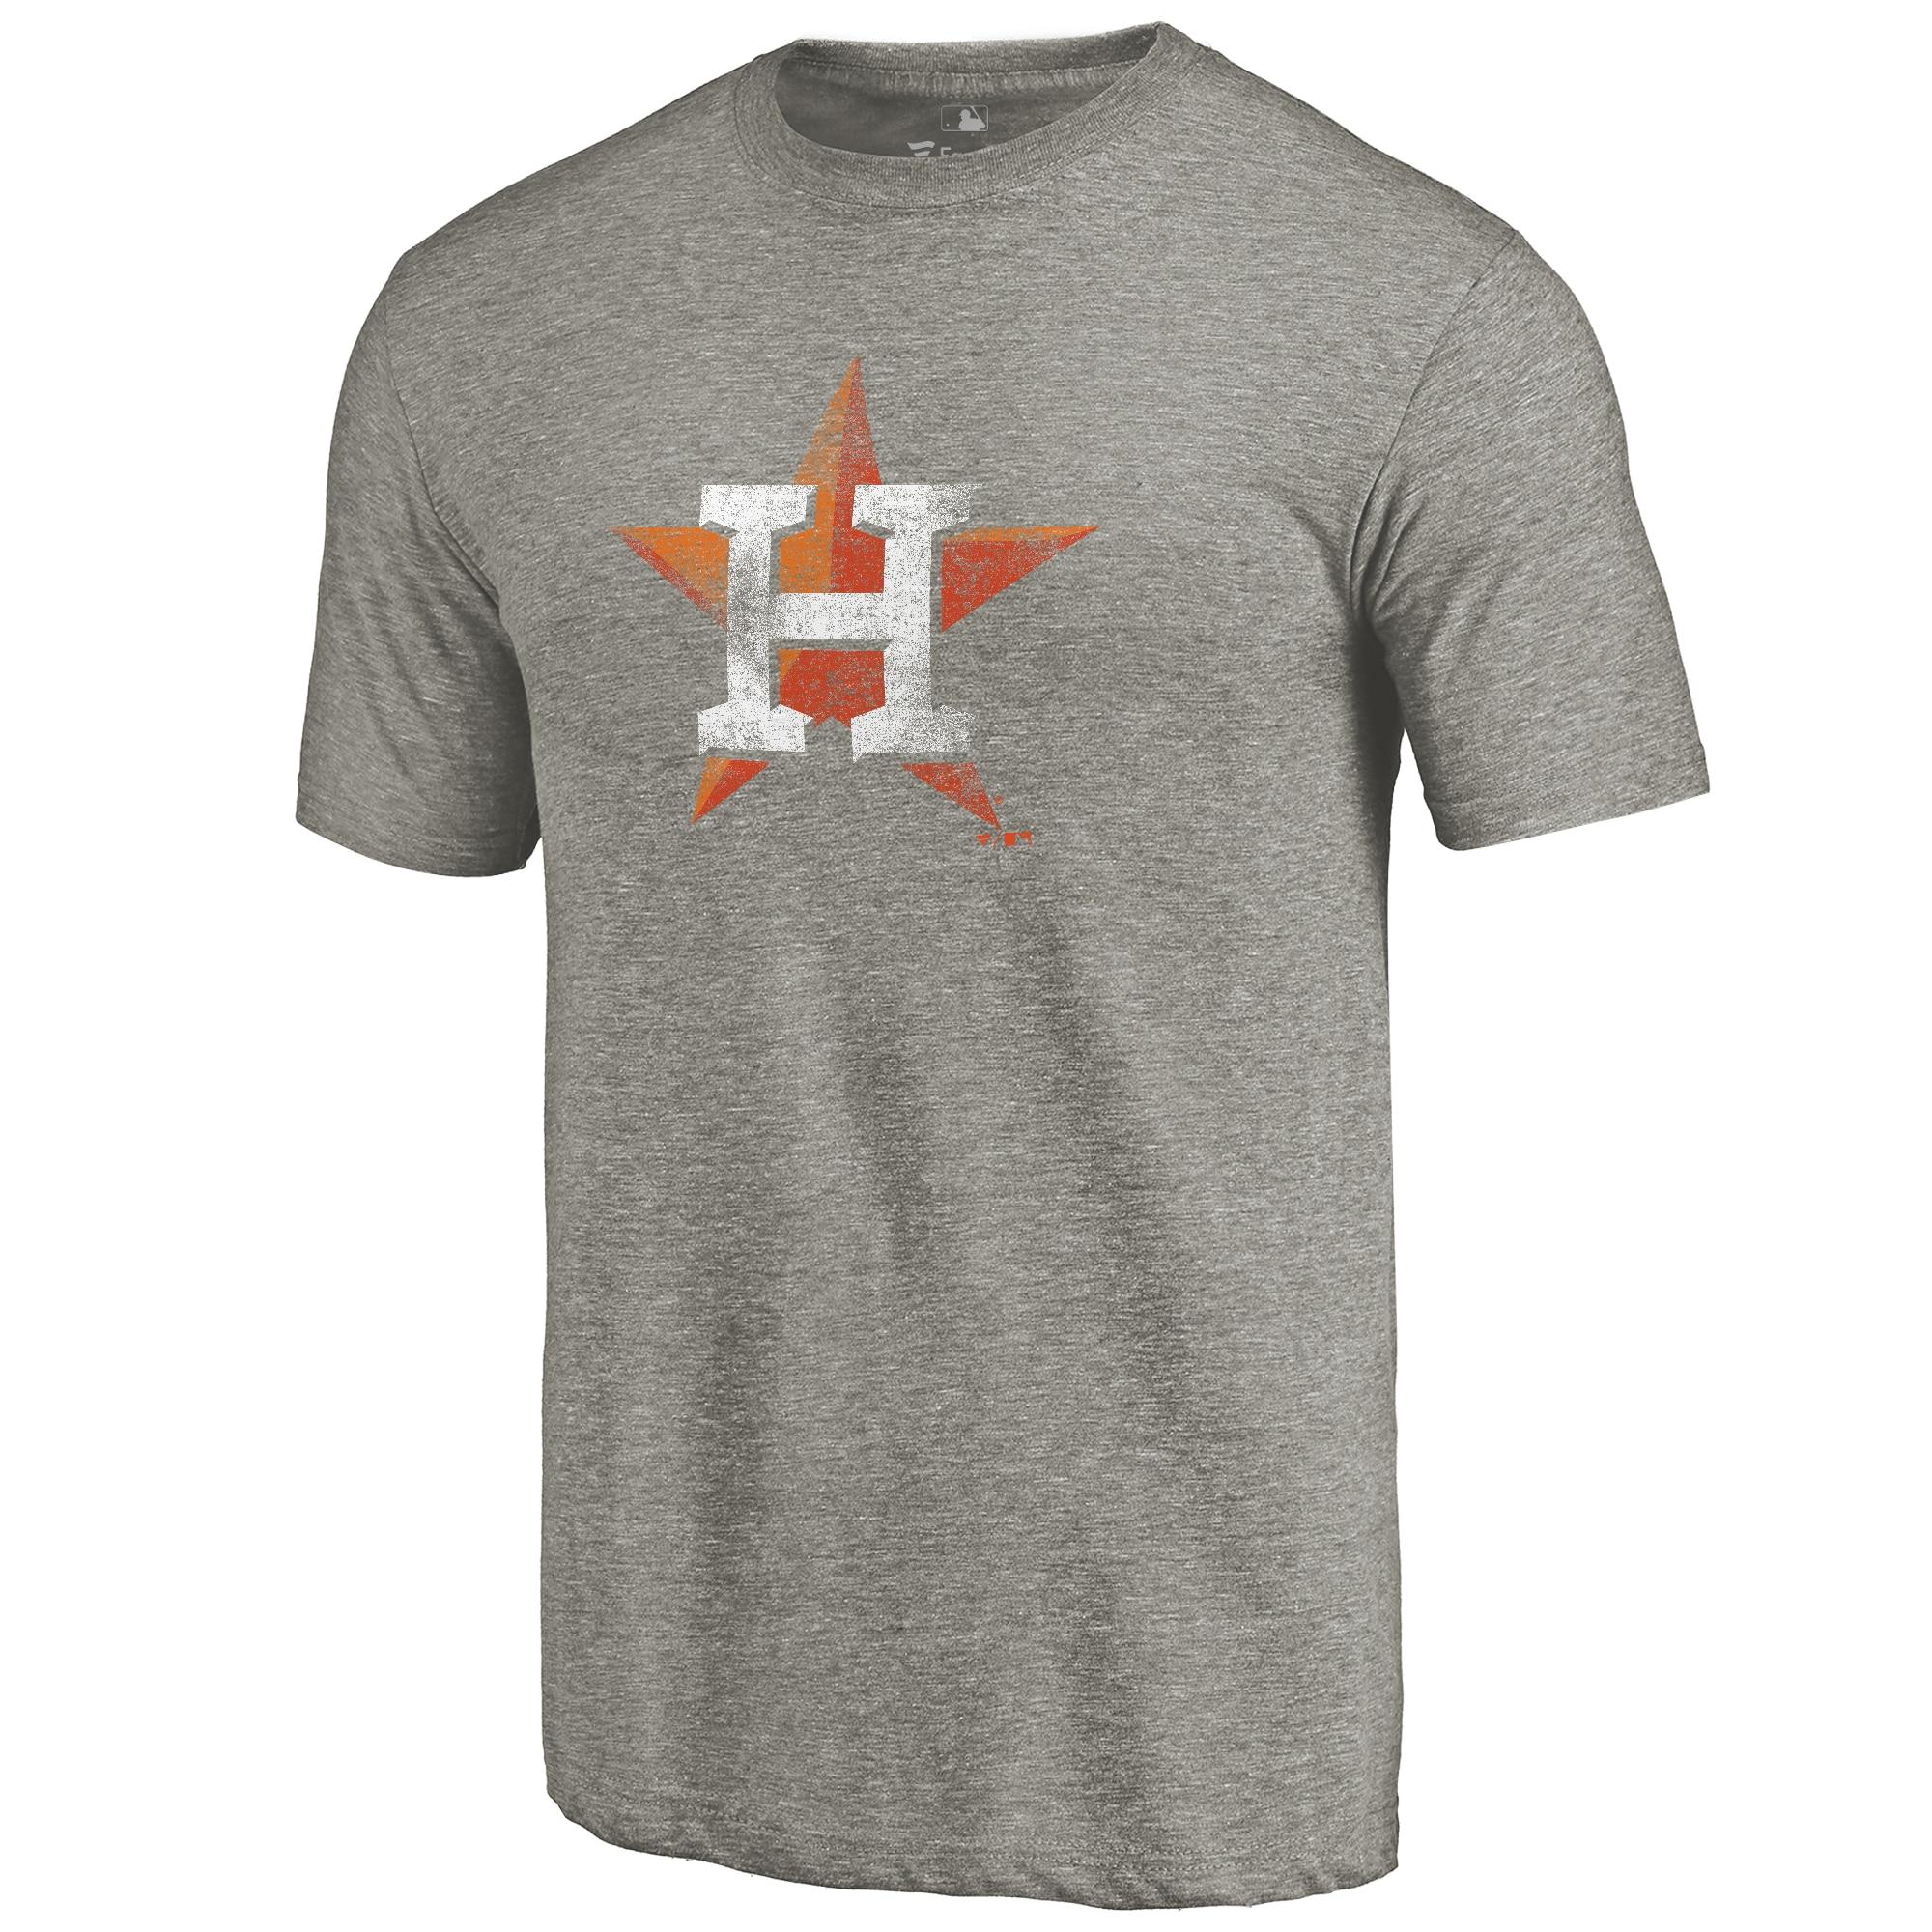 Houston Astros Distressed Team Tri-Blend T-Shirt - Ash